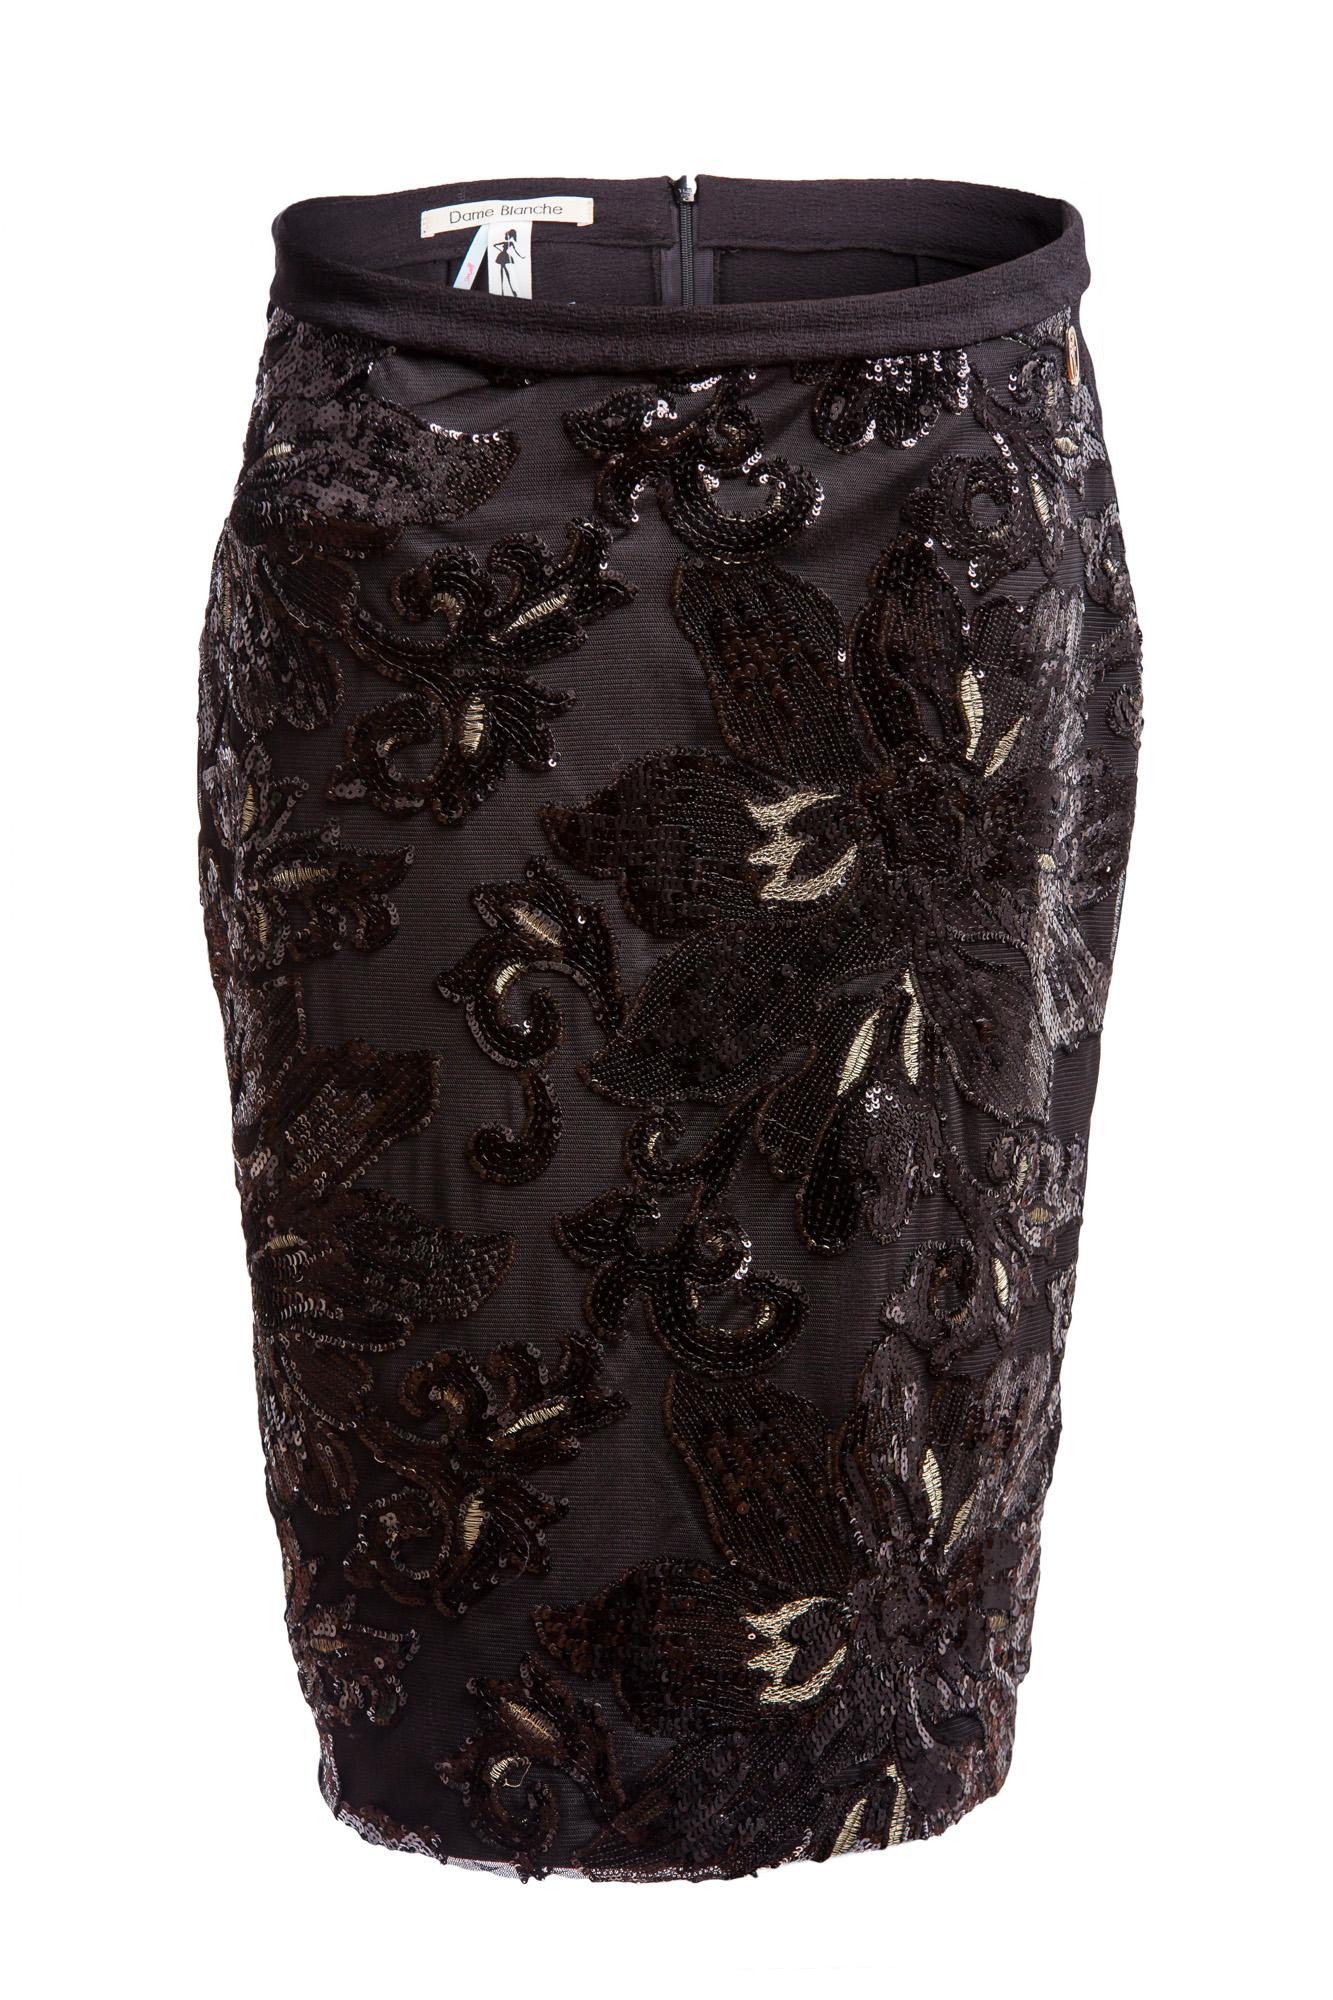 Dame Blanche - Pencil Skirt Black-17.jpg